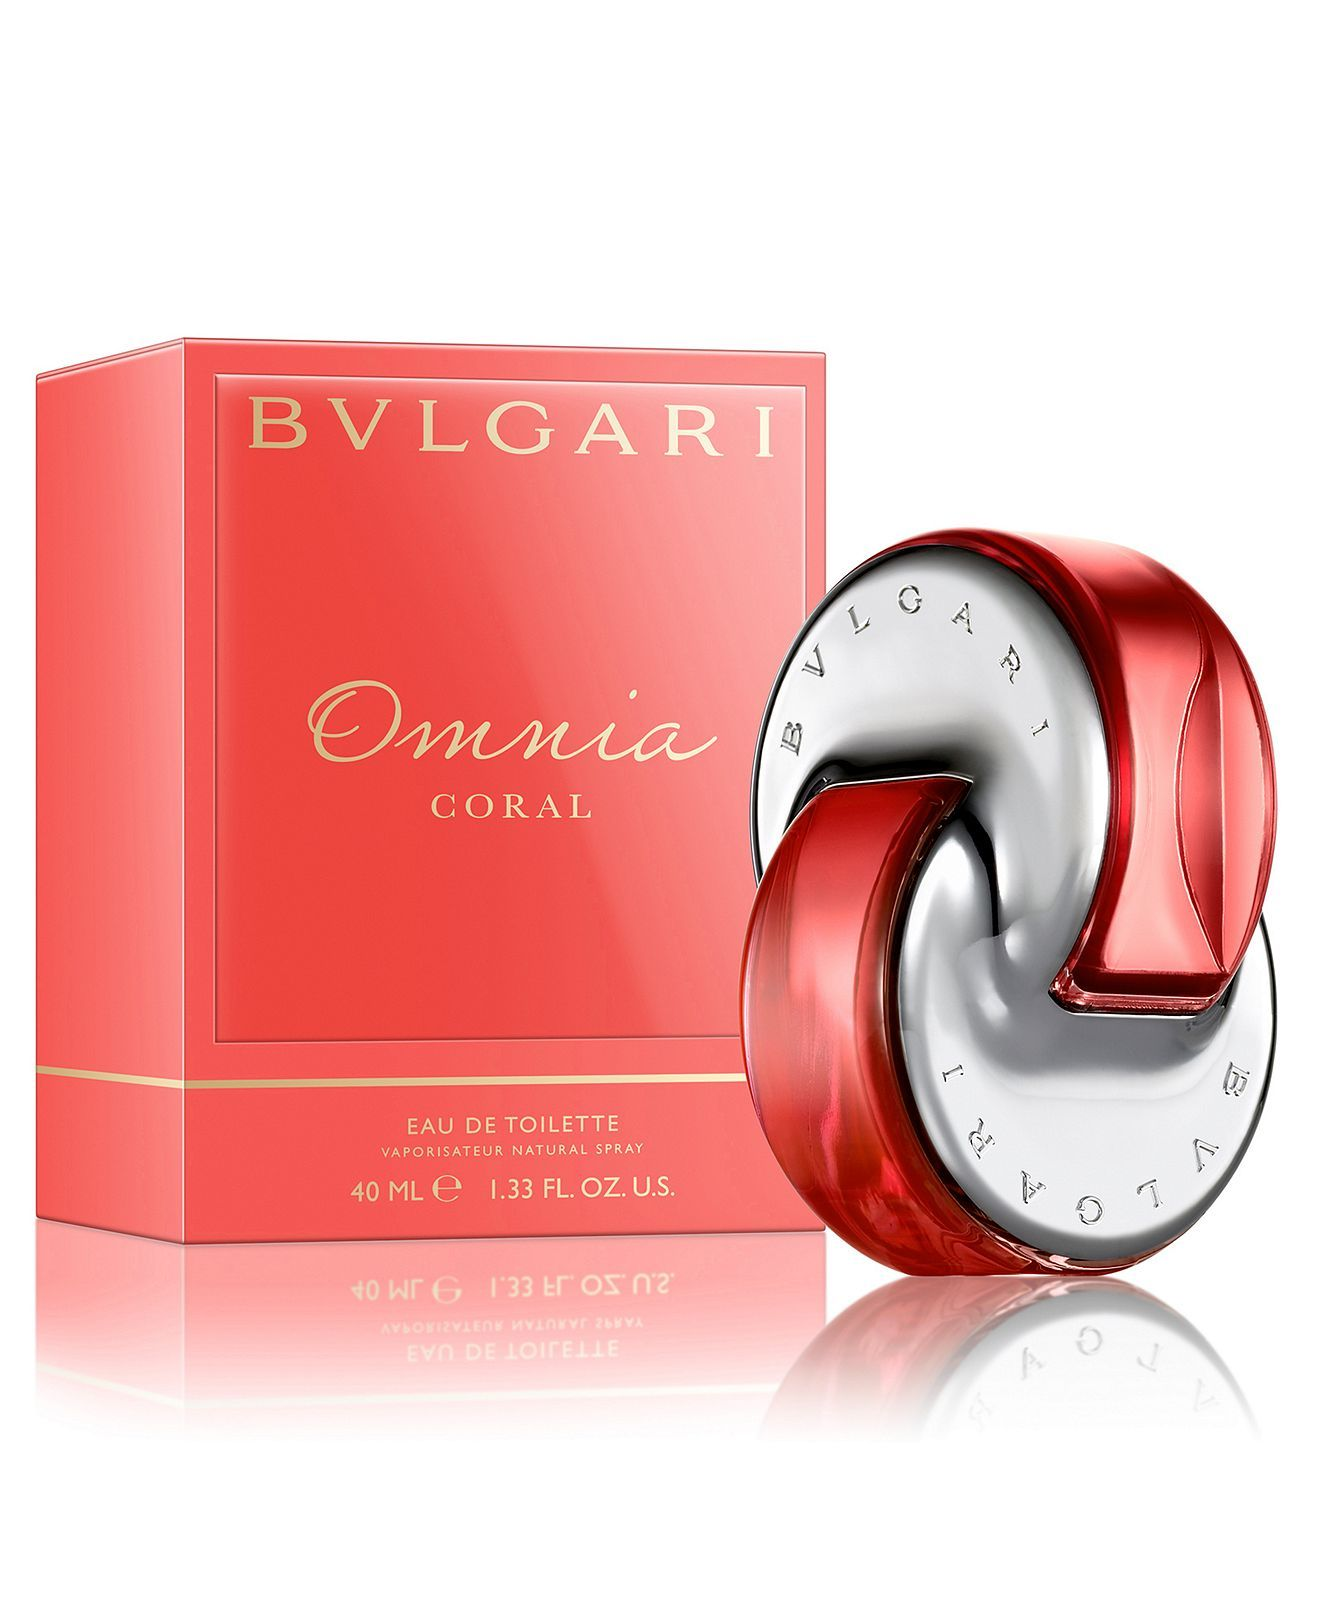 Bvlgari Omnia Coral Eau De Toilette Spray 1 3 Oz Reviews All Perfume Beauty Macy S Omnia Coral Bvlgari Omnia Coral Perfume